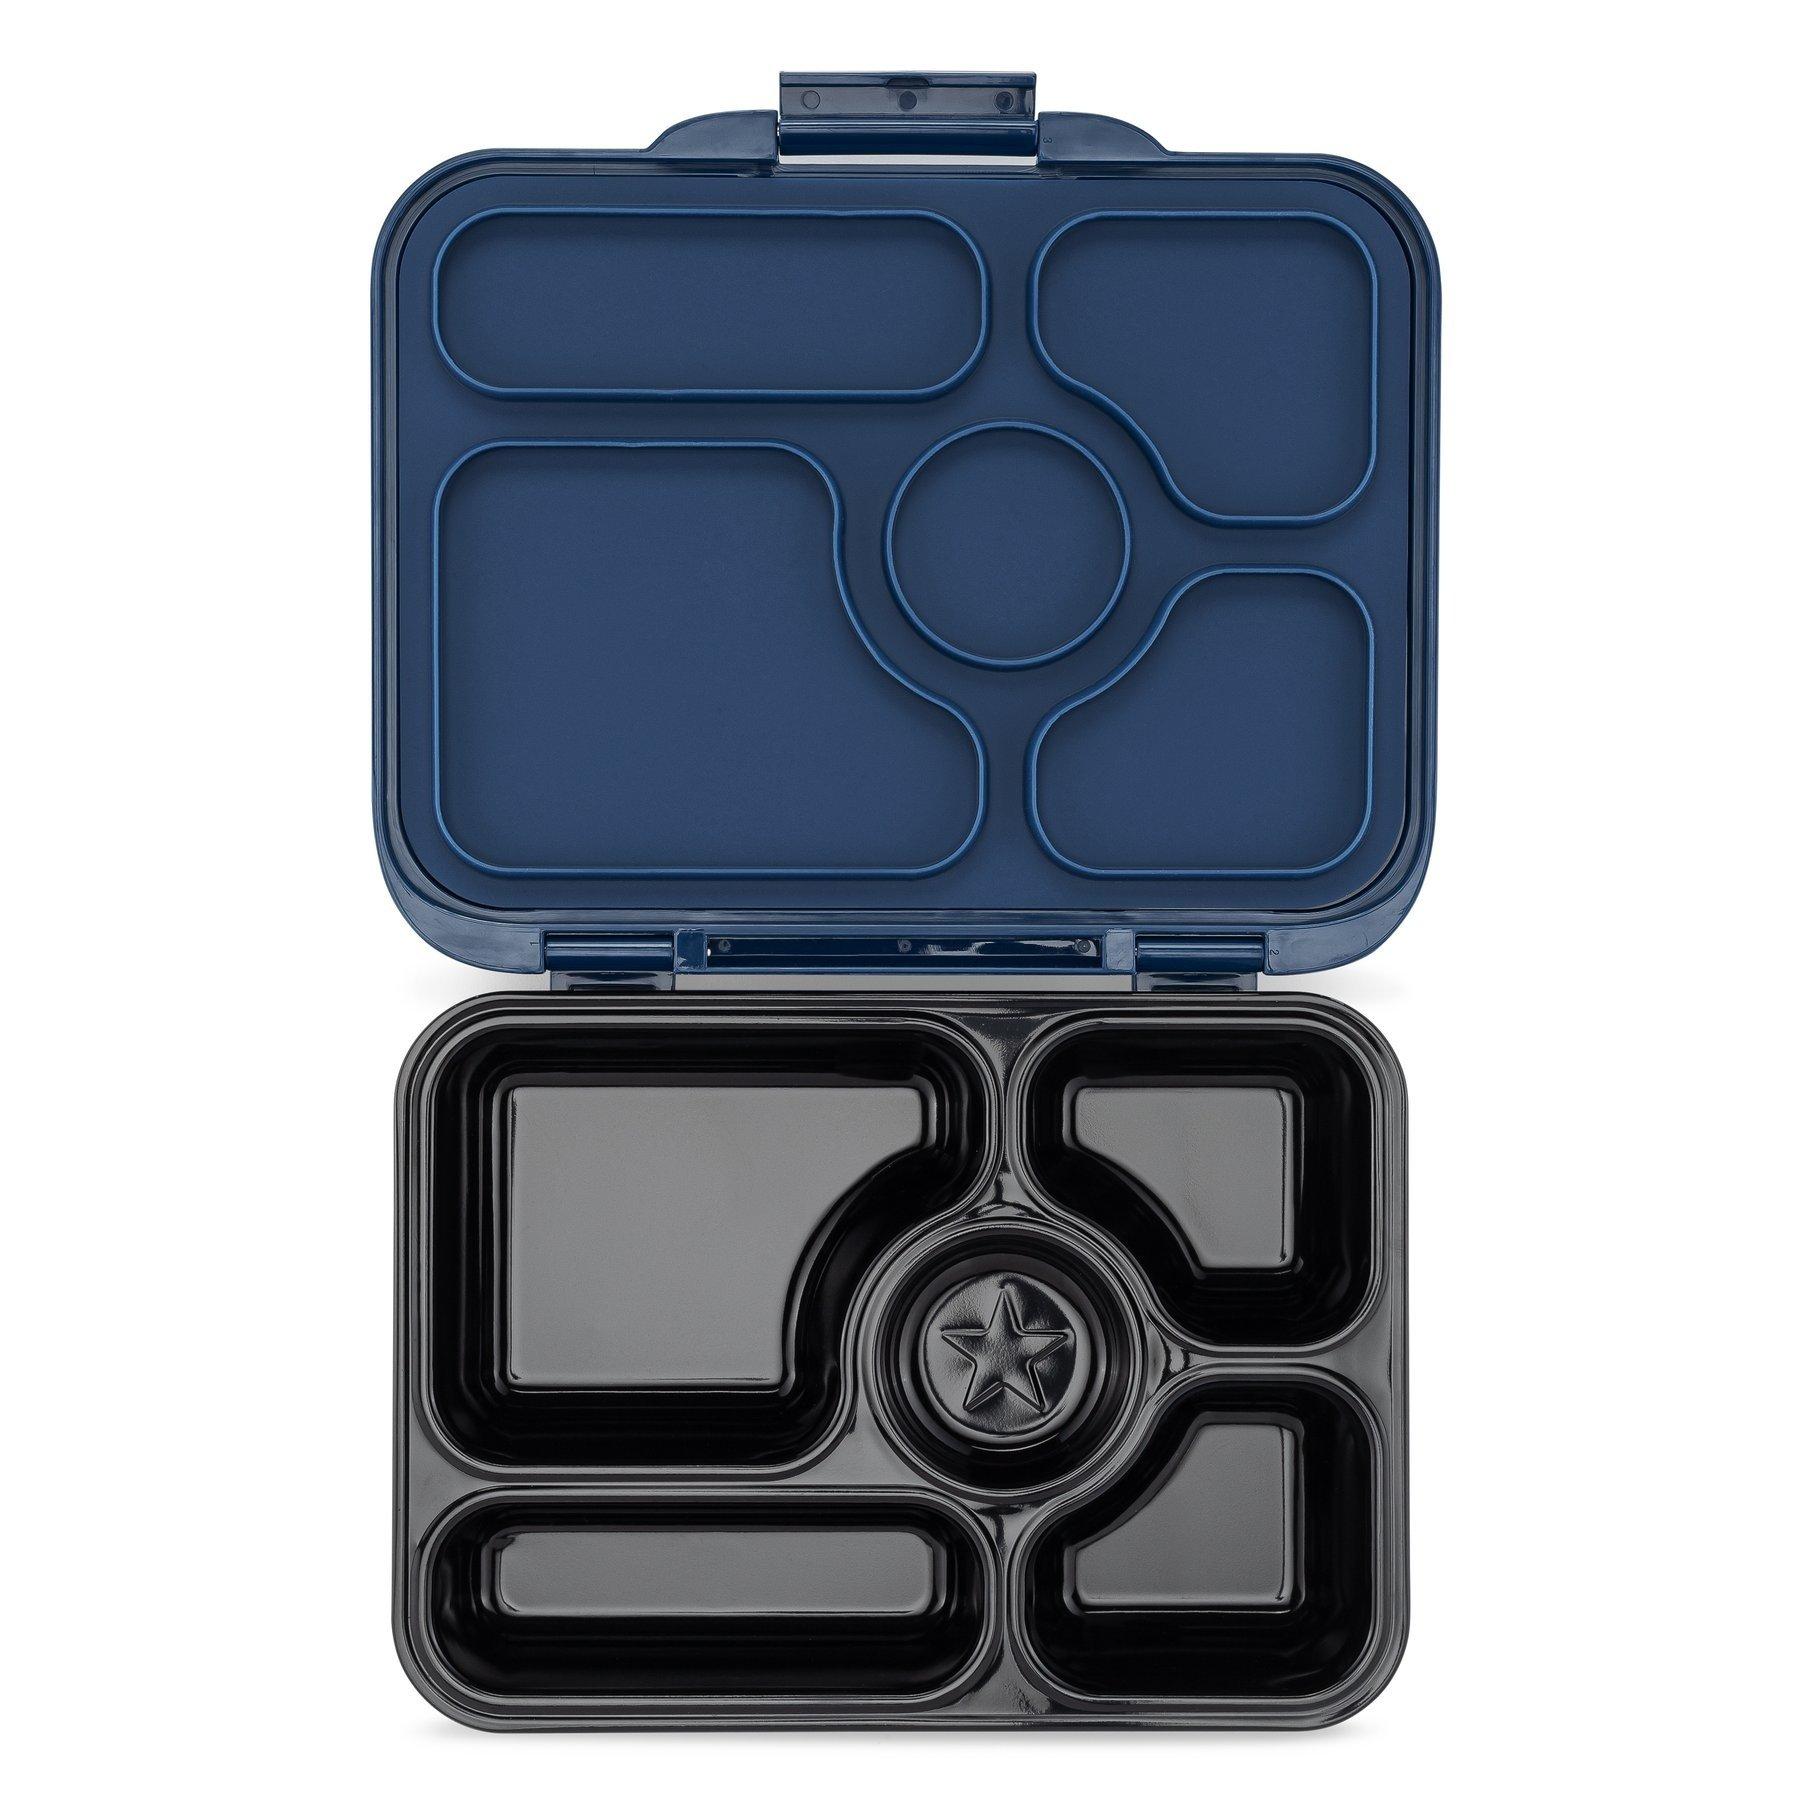 Stainless steel Bento Box with ceramic tray - Santa Fe blue-2